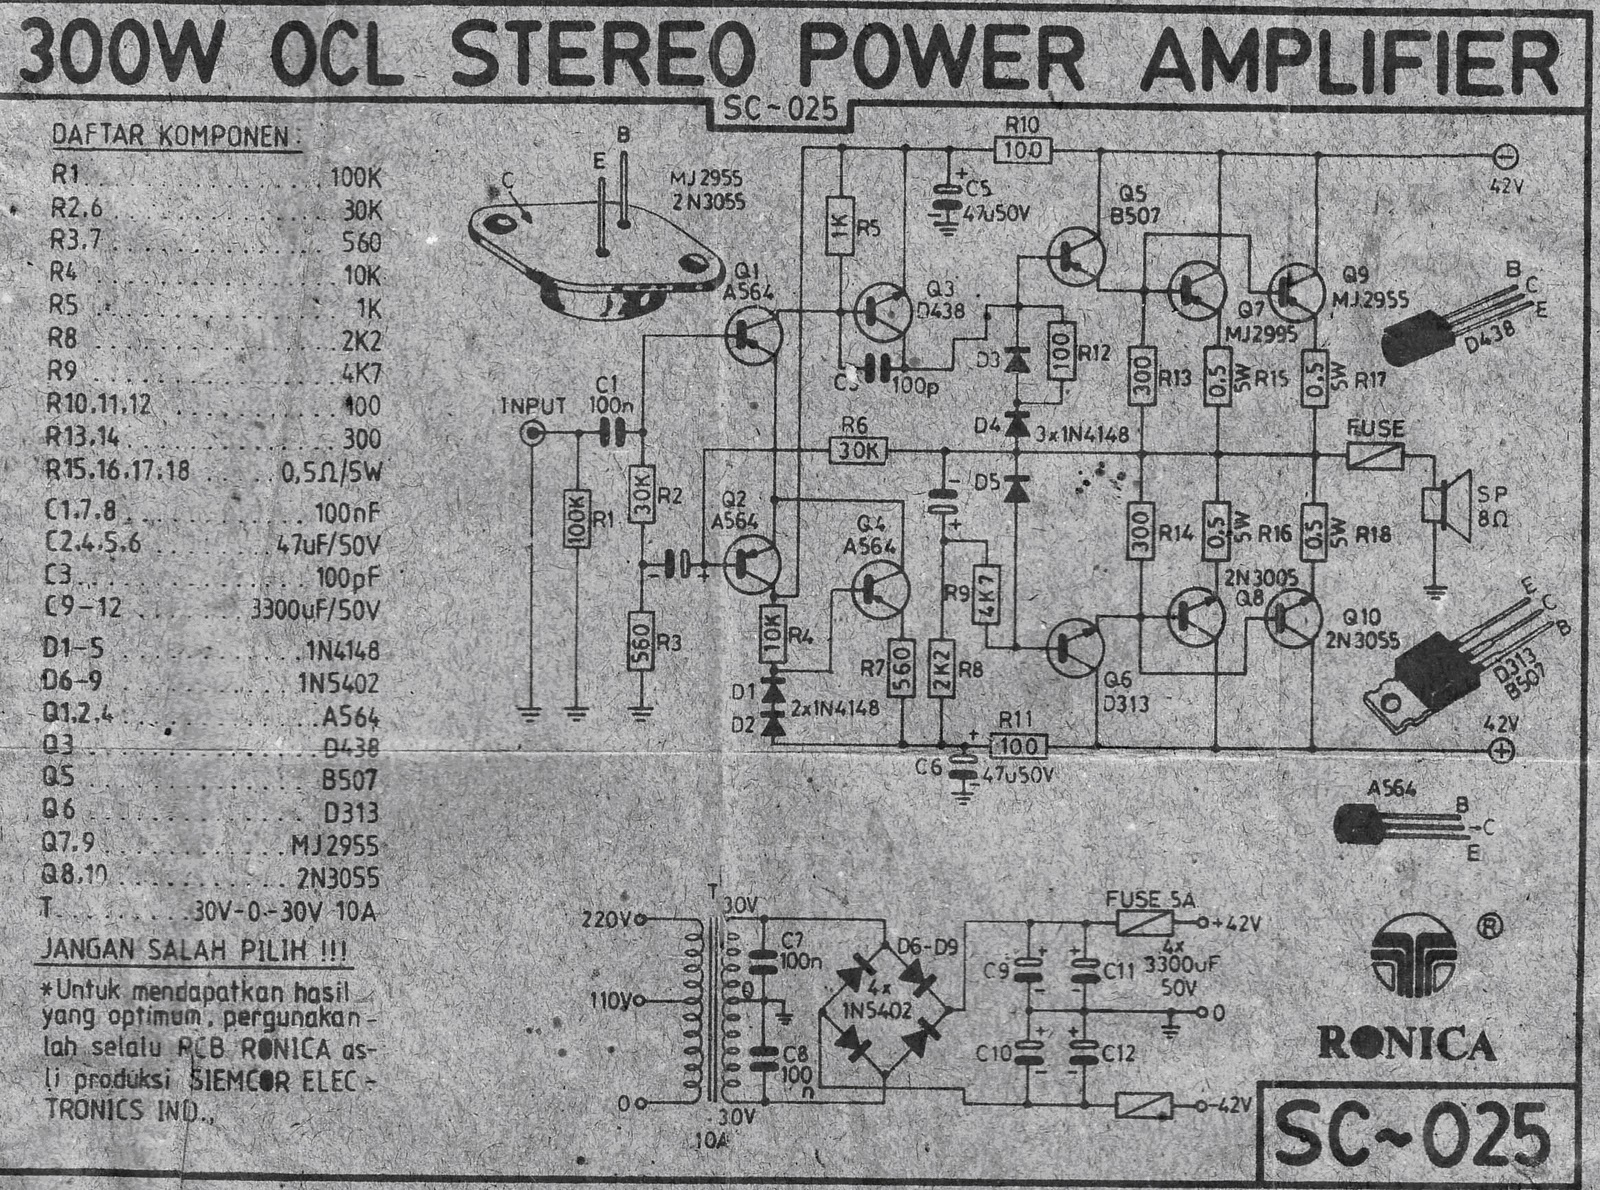 hight resolution of 300w power amplifier ocl circuit audiobbm com let s do it simple electric generator diagram http polnischesteinkohleeu